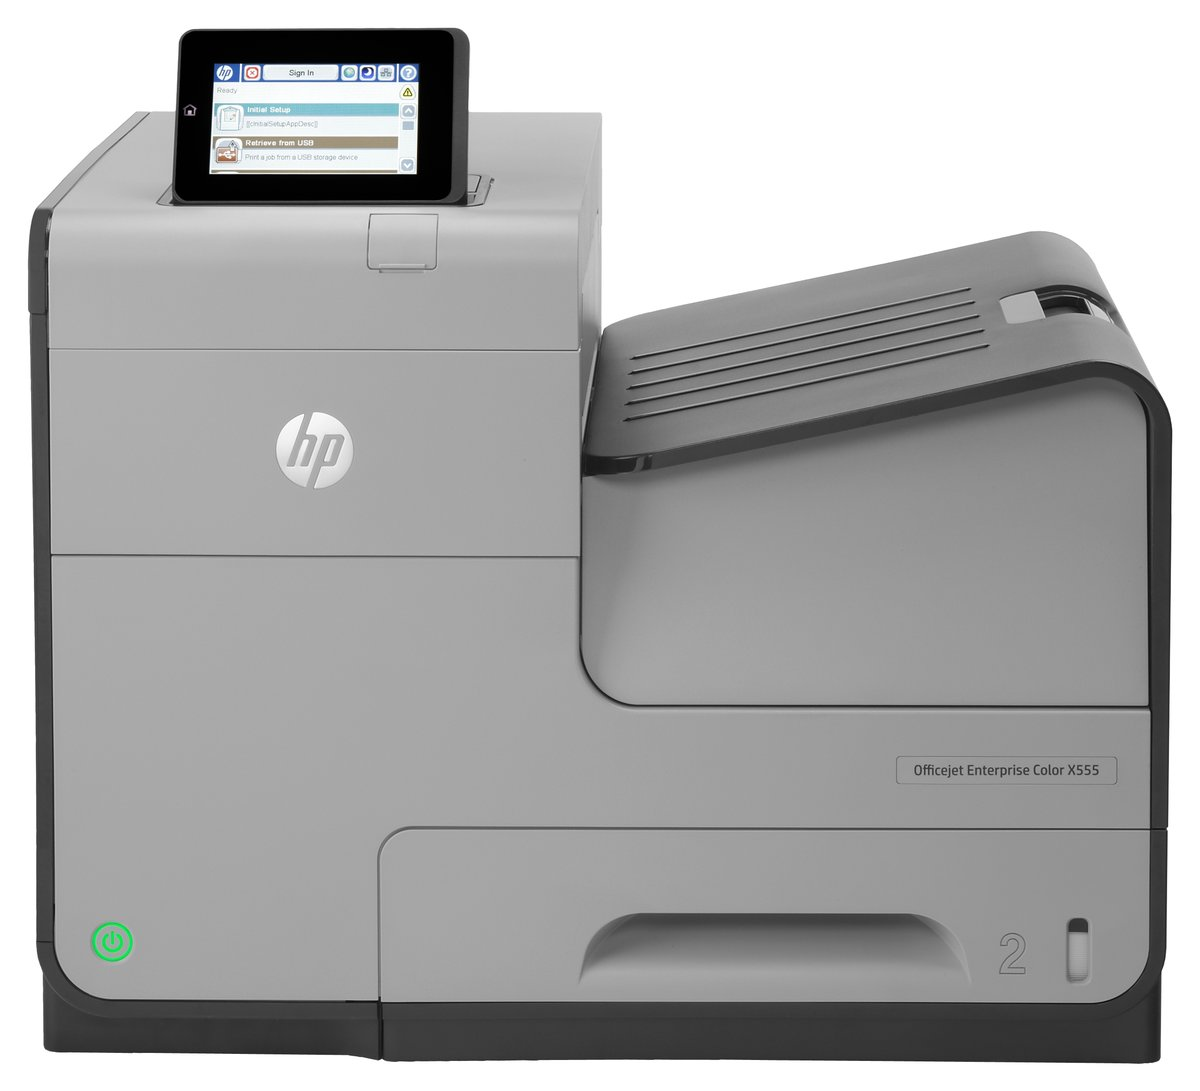 HP Officejet X555dn Inkjet Printer Color 2400 x 1200 dpi Print ...